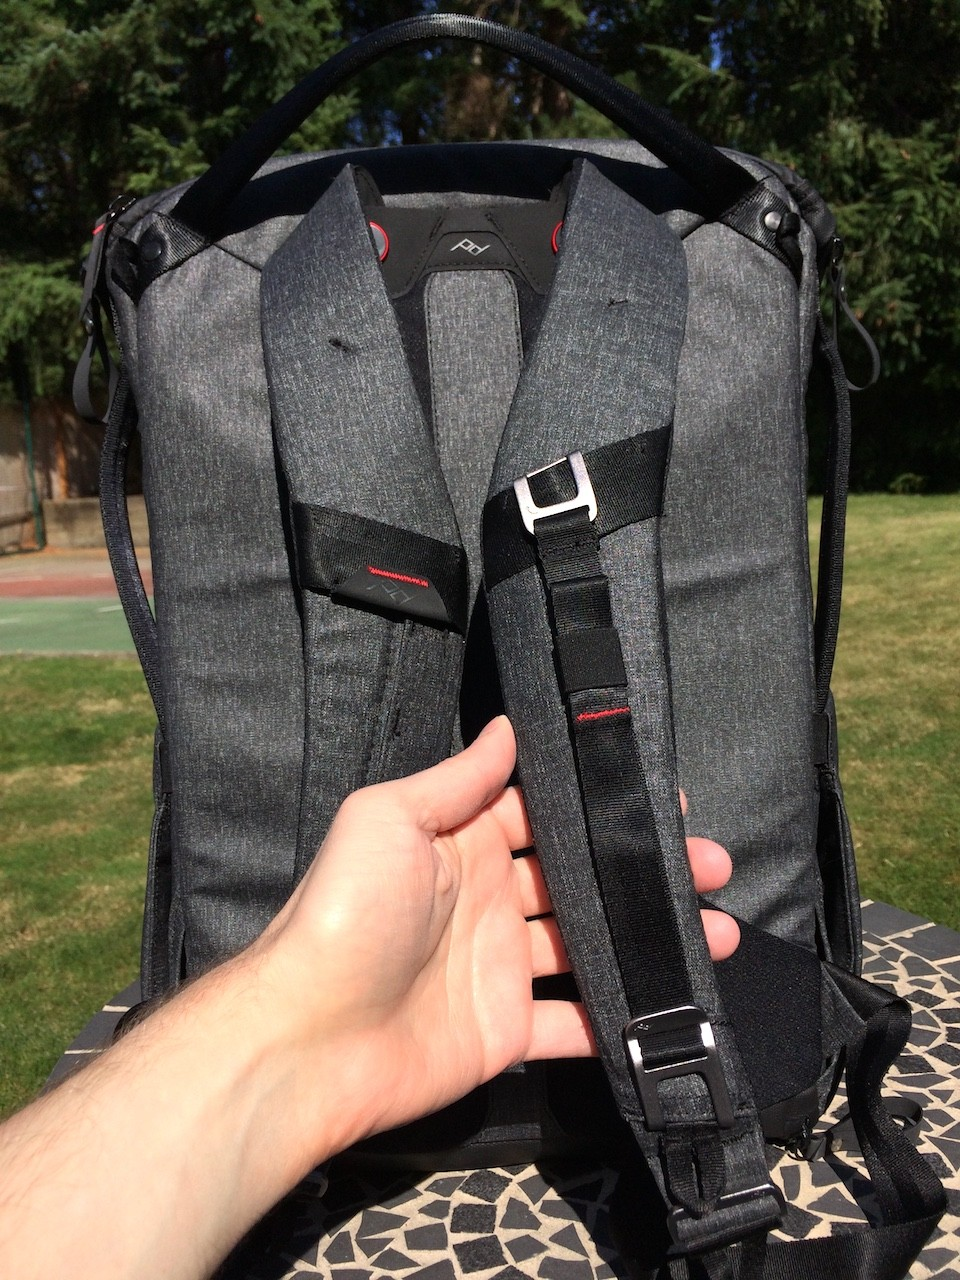 Peak Design Everyday Backpack sternum strap storage